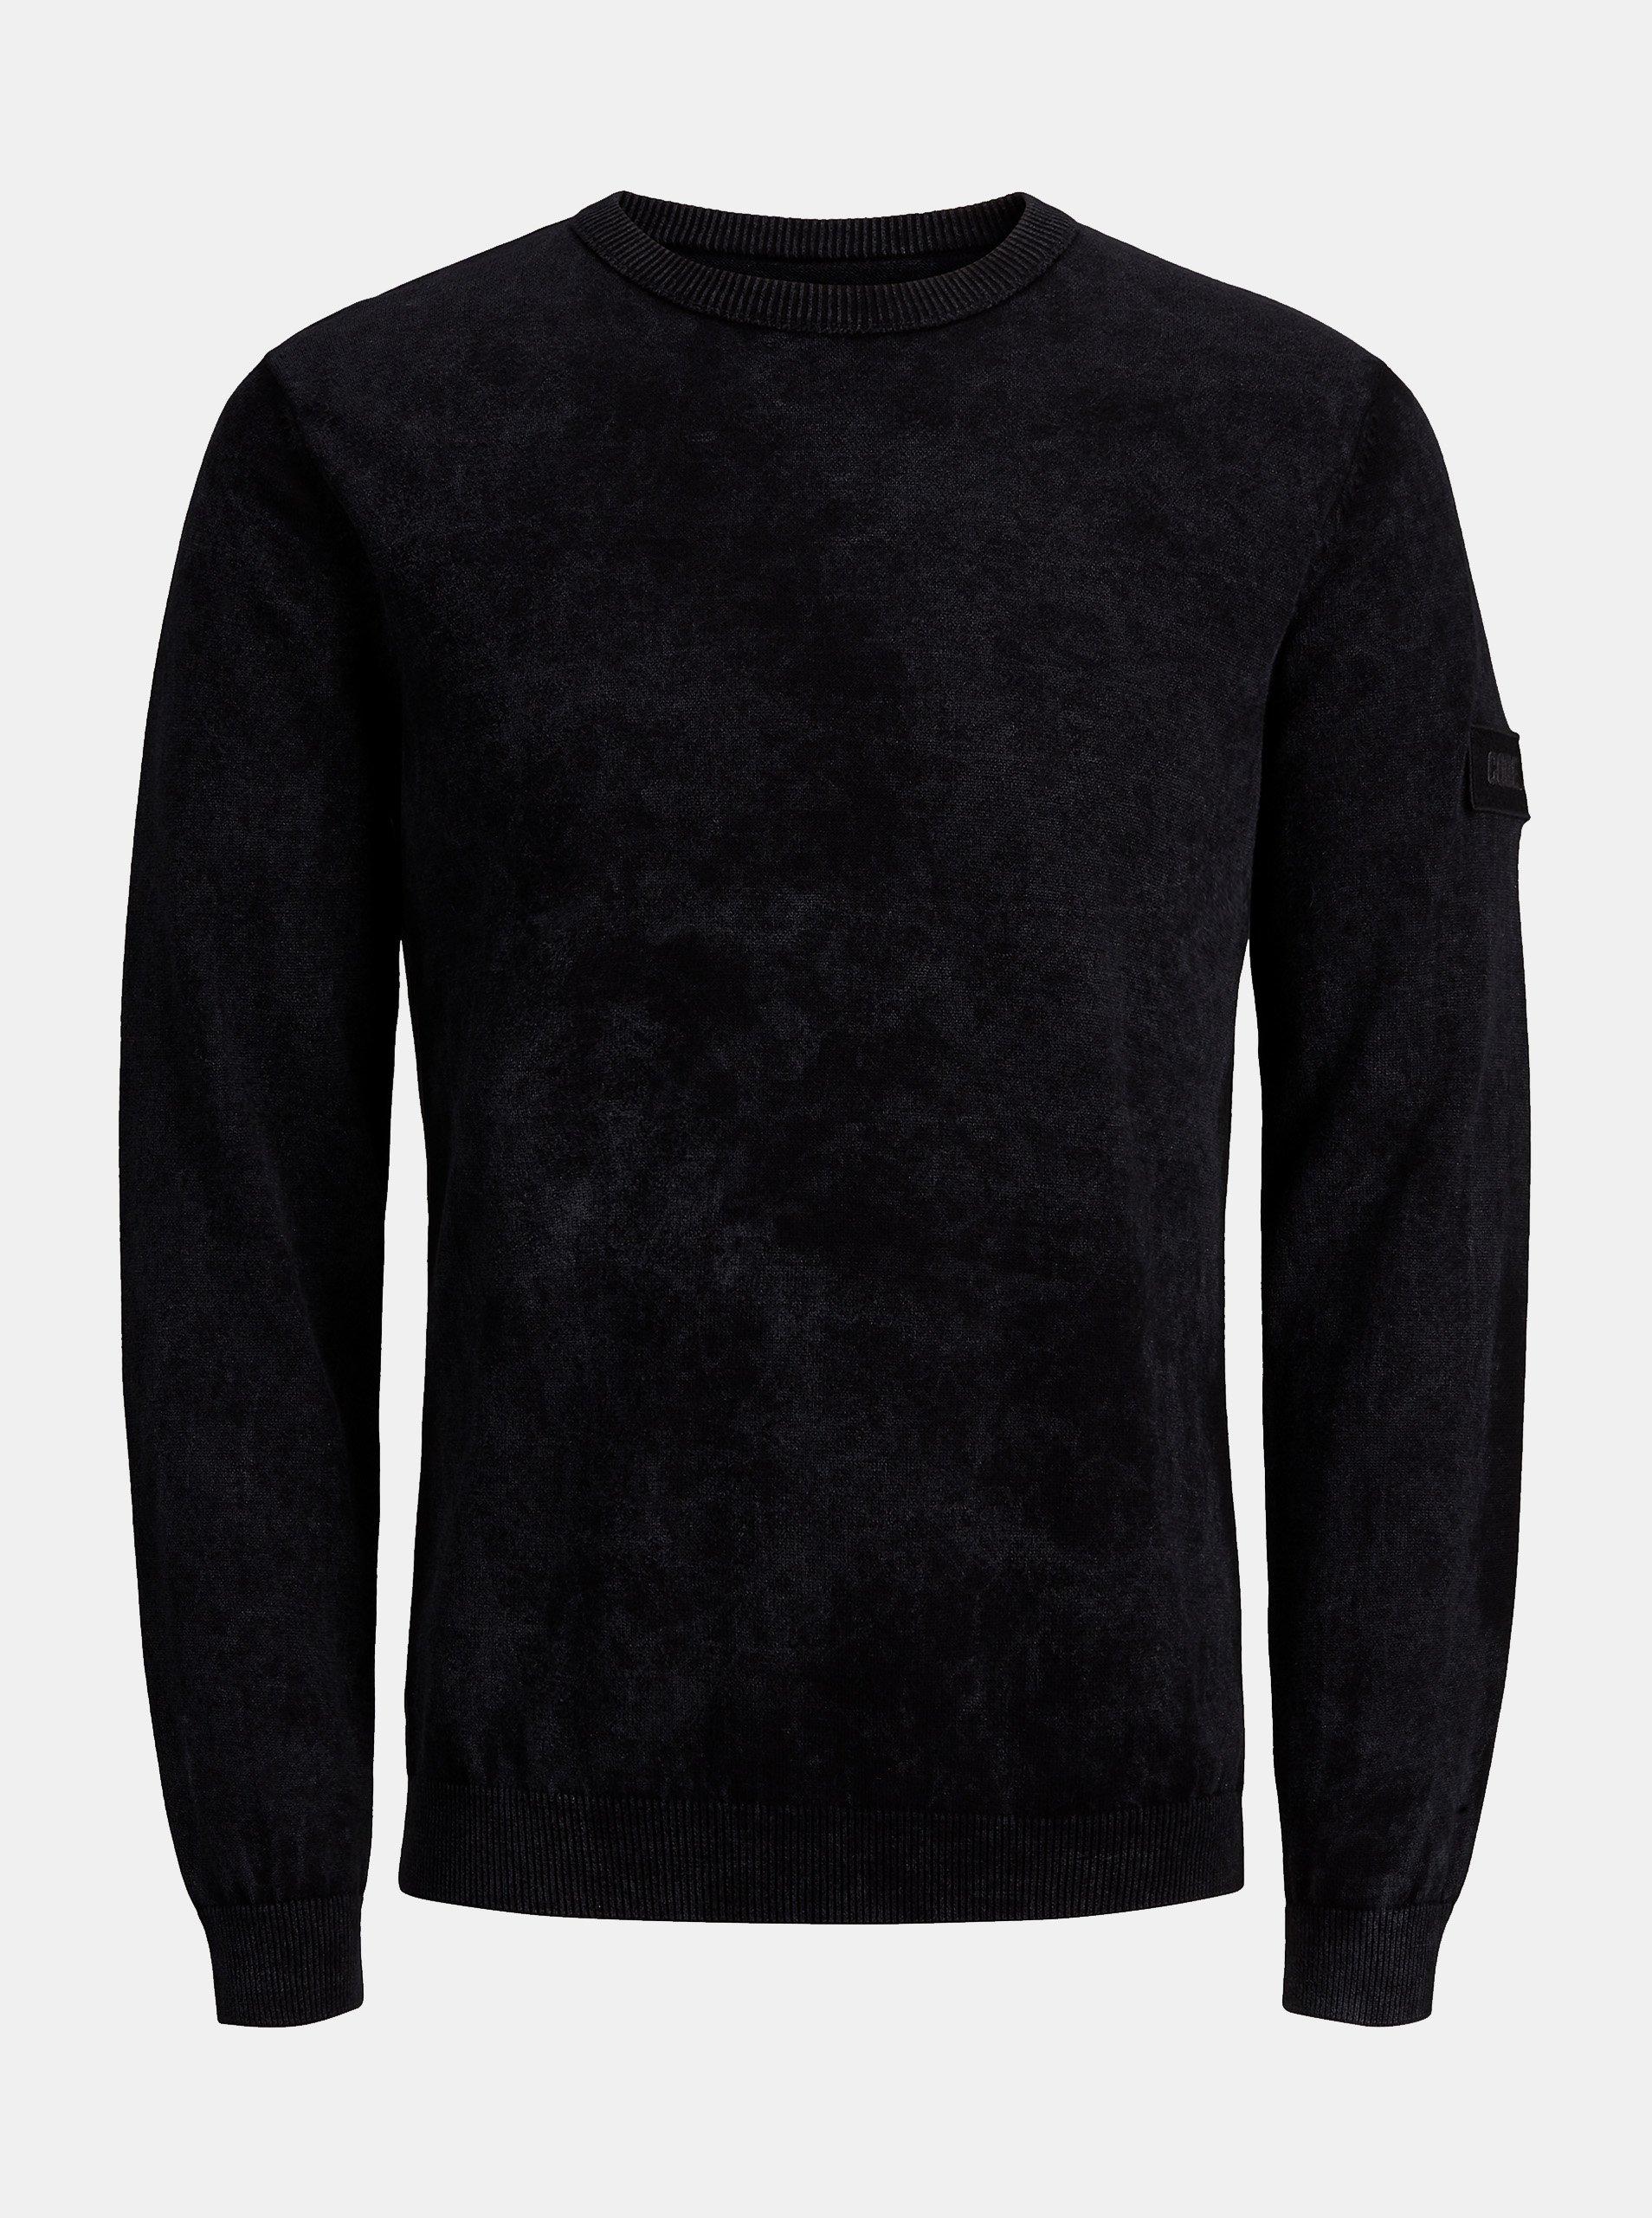 Černý lehký svetr Jack & Jones Knit